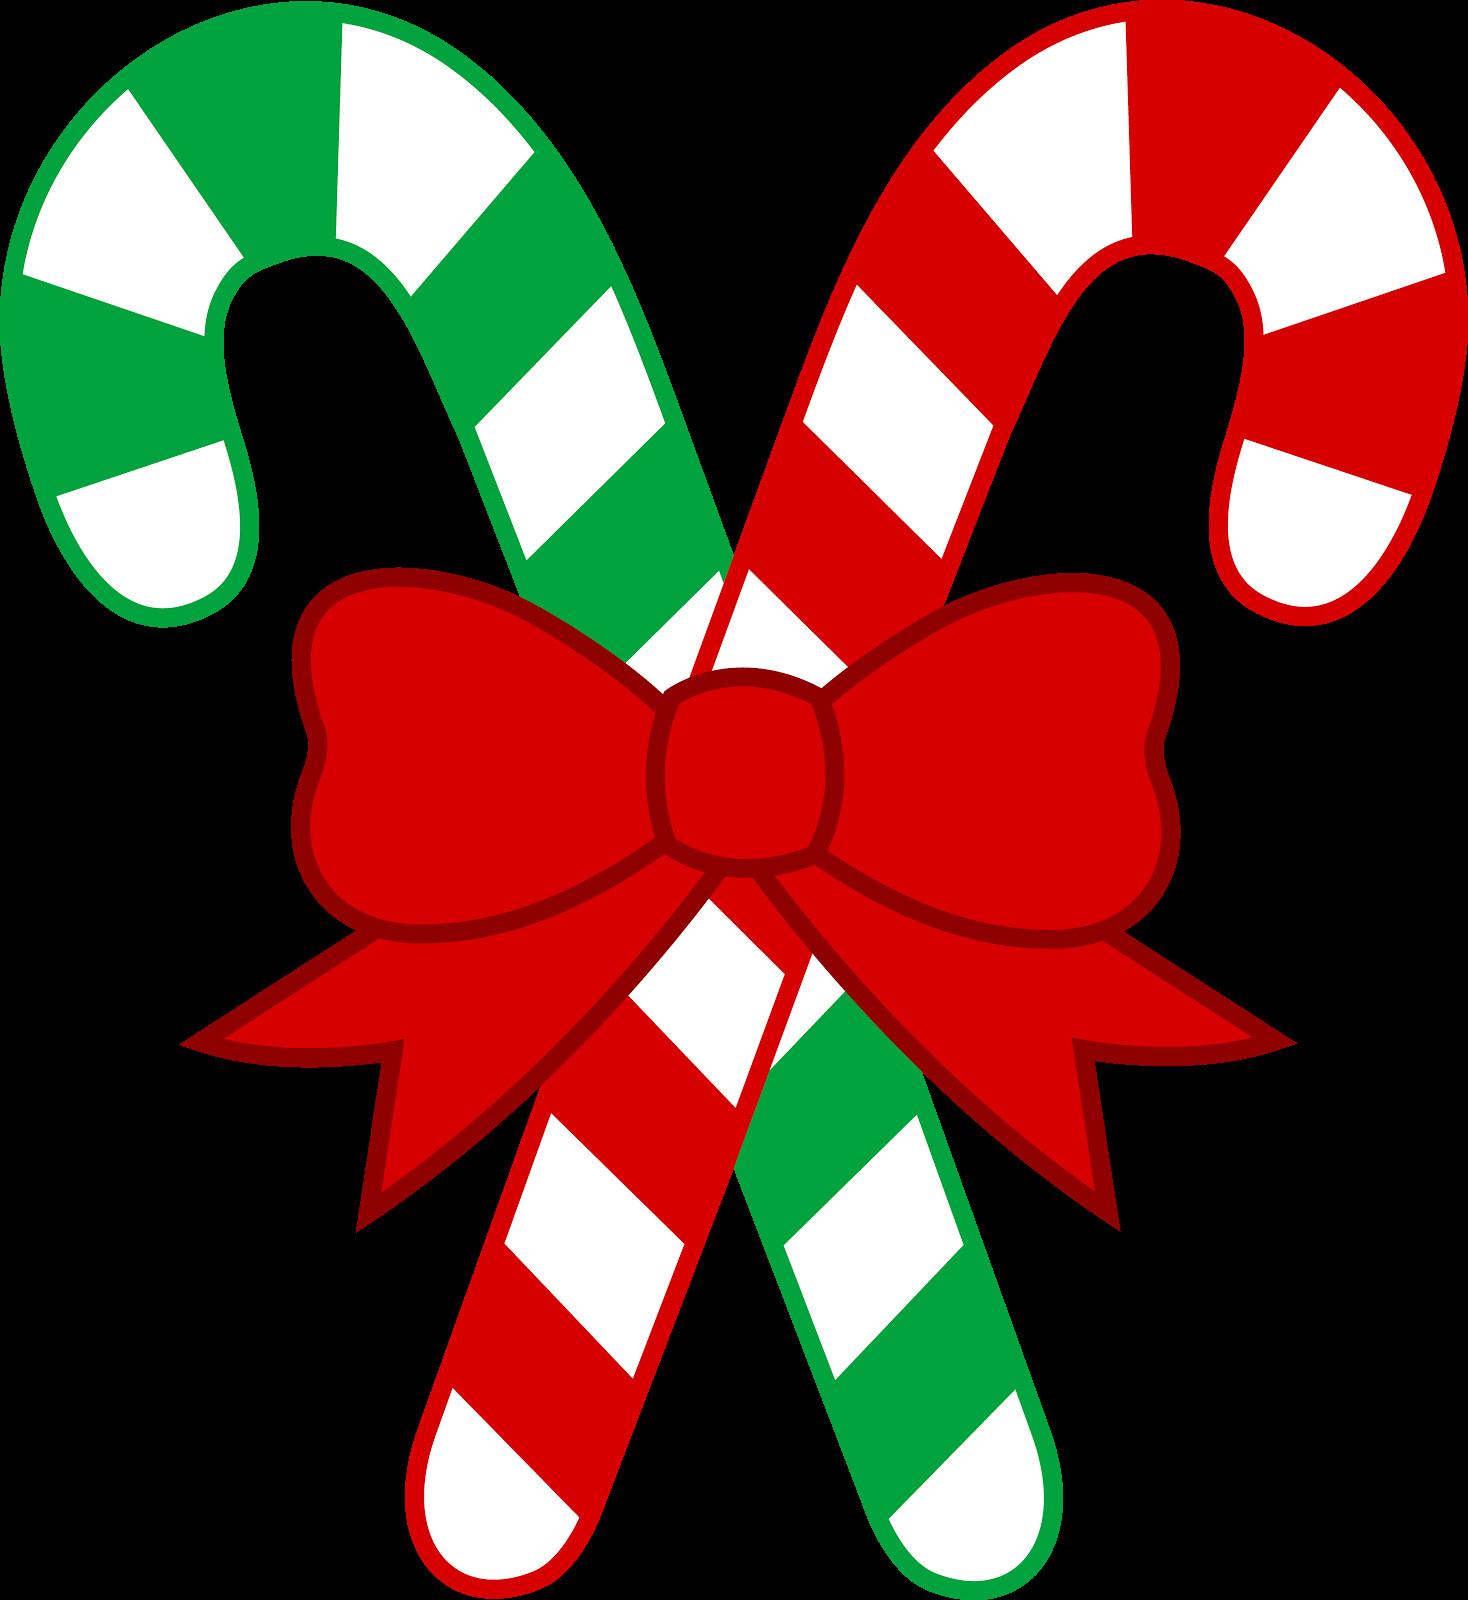 Christmas Candy Canes  Fantastic Dreams of Pamela K Kinney December 2012